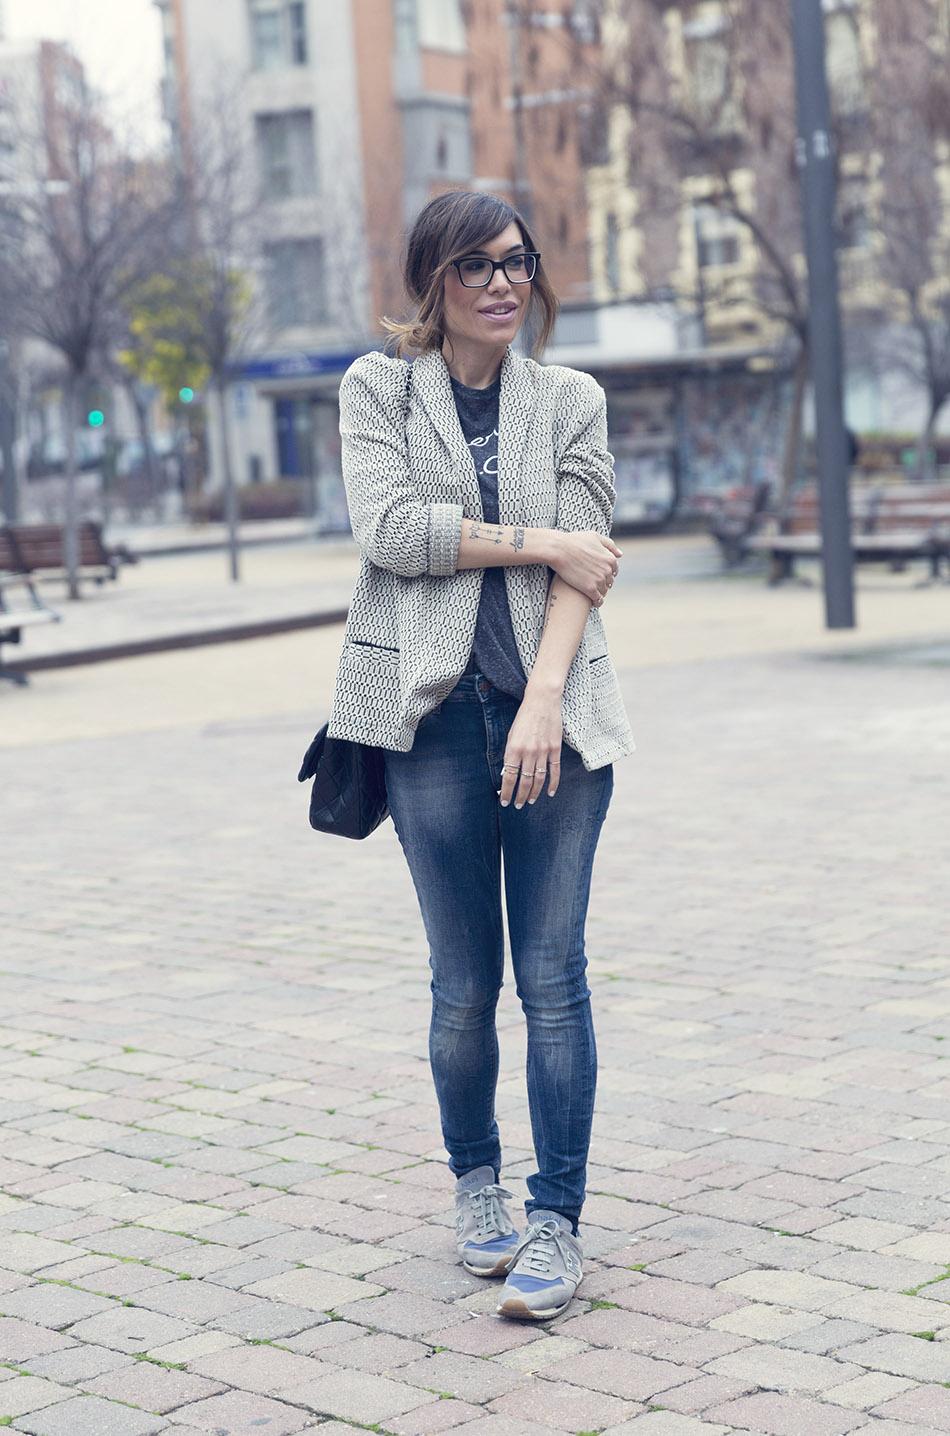 streetstyle con camiseta de à bicyclette, blazer de anna studio, jeans de hakei, bolsos 2.55 de chanel y gafas de the fab glasses. bárbara crespo. sneakers hakei